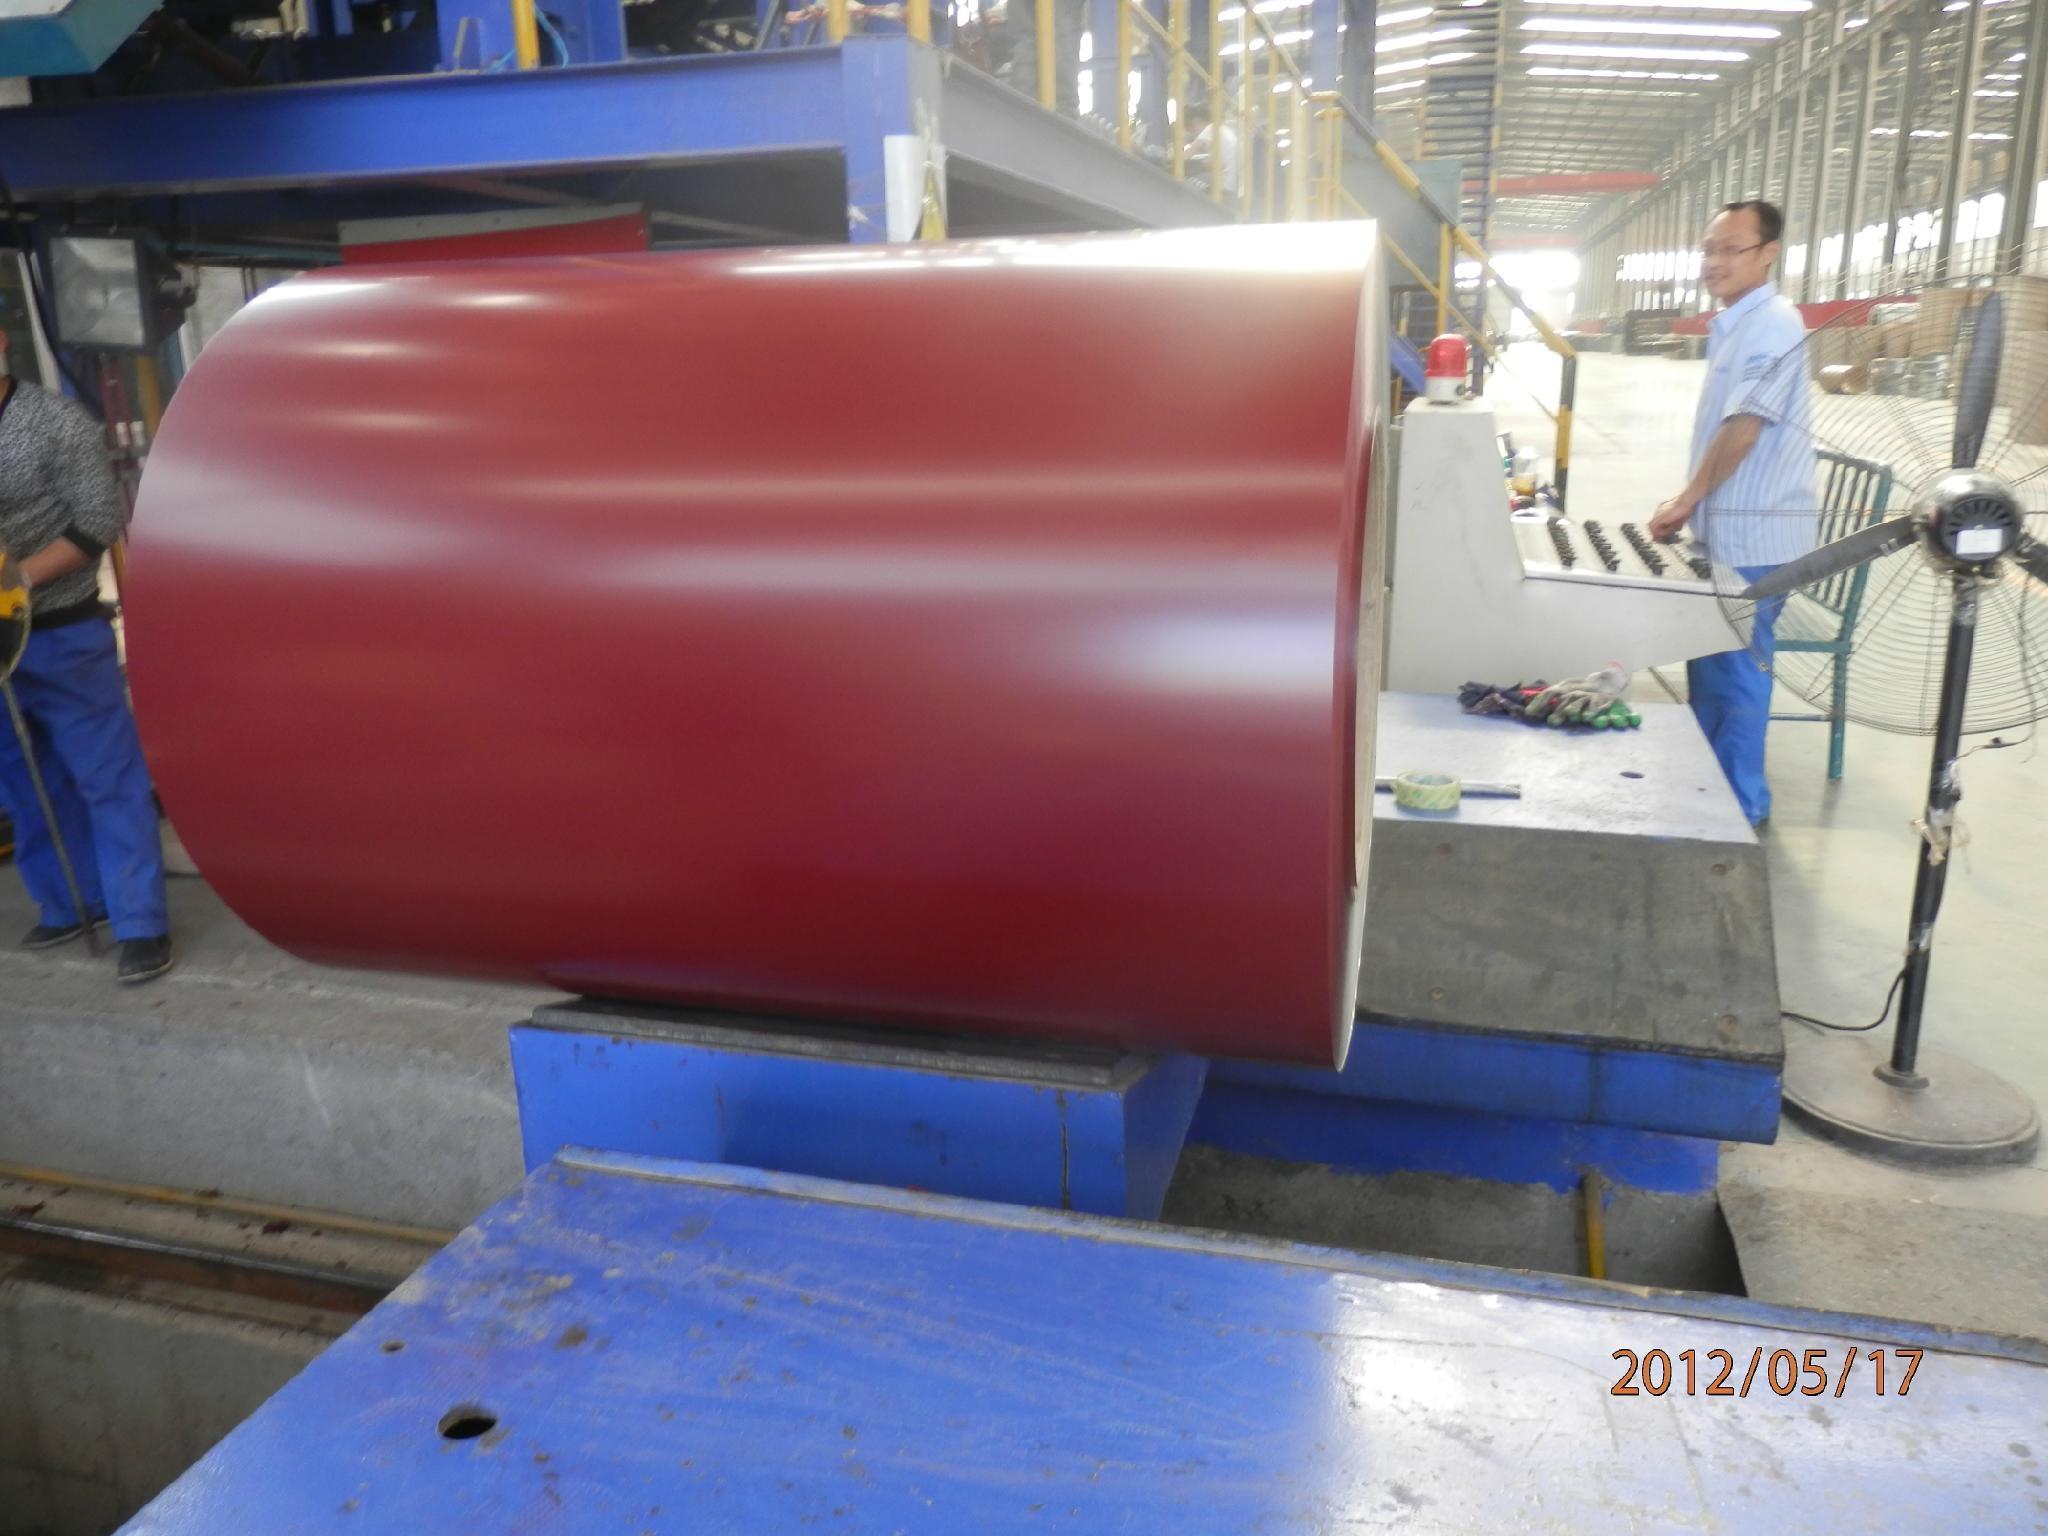 RAL3005 prepainted galvanized steel coils